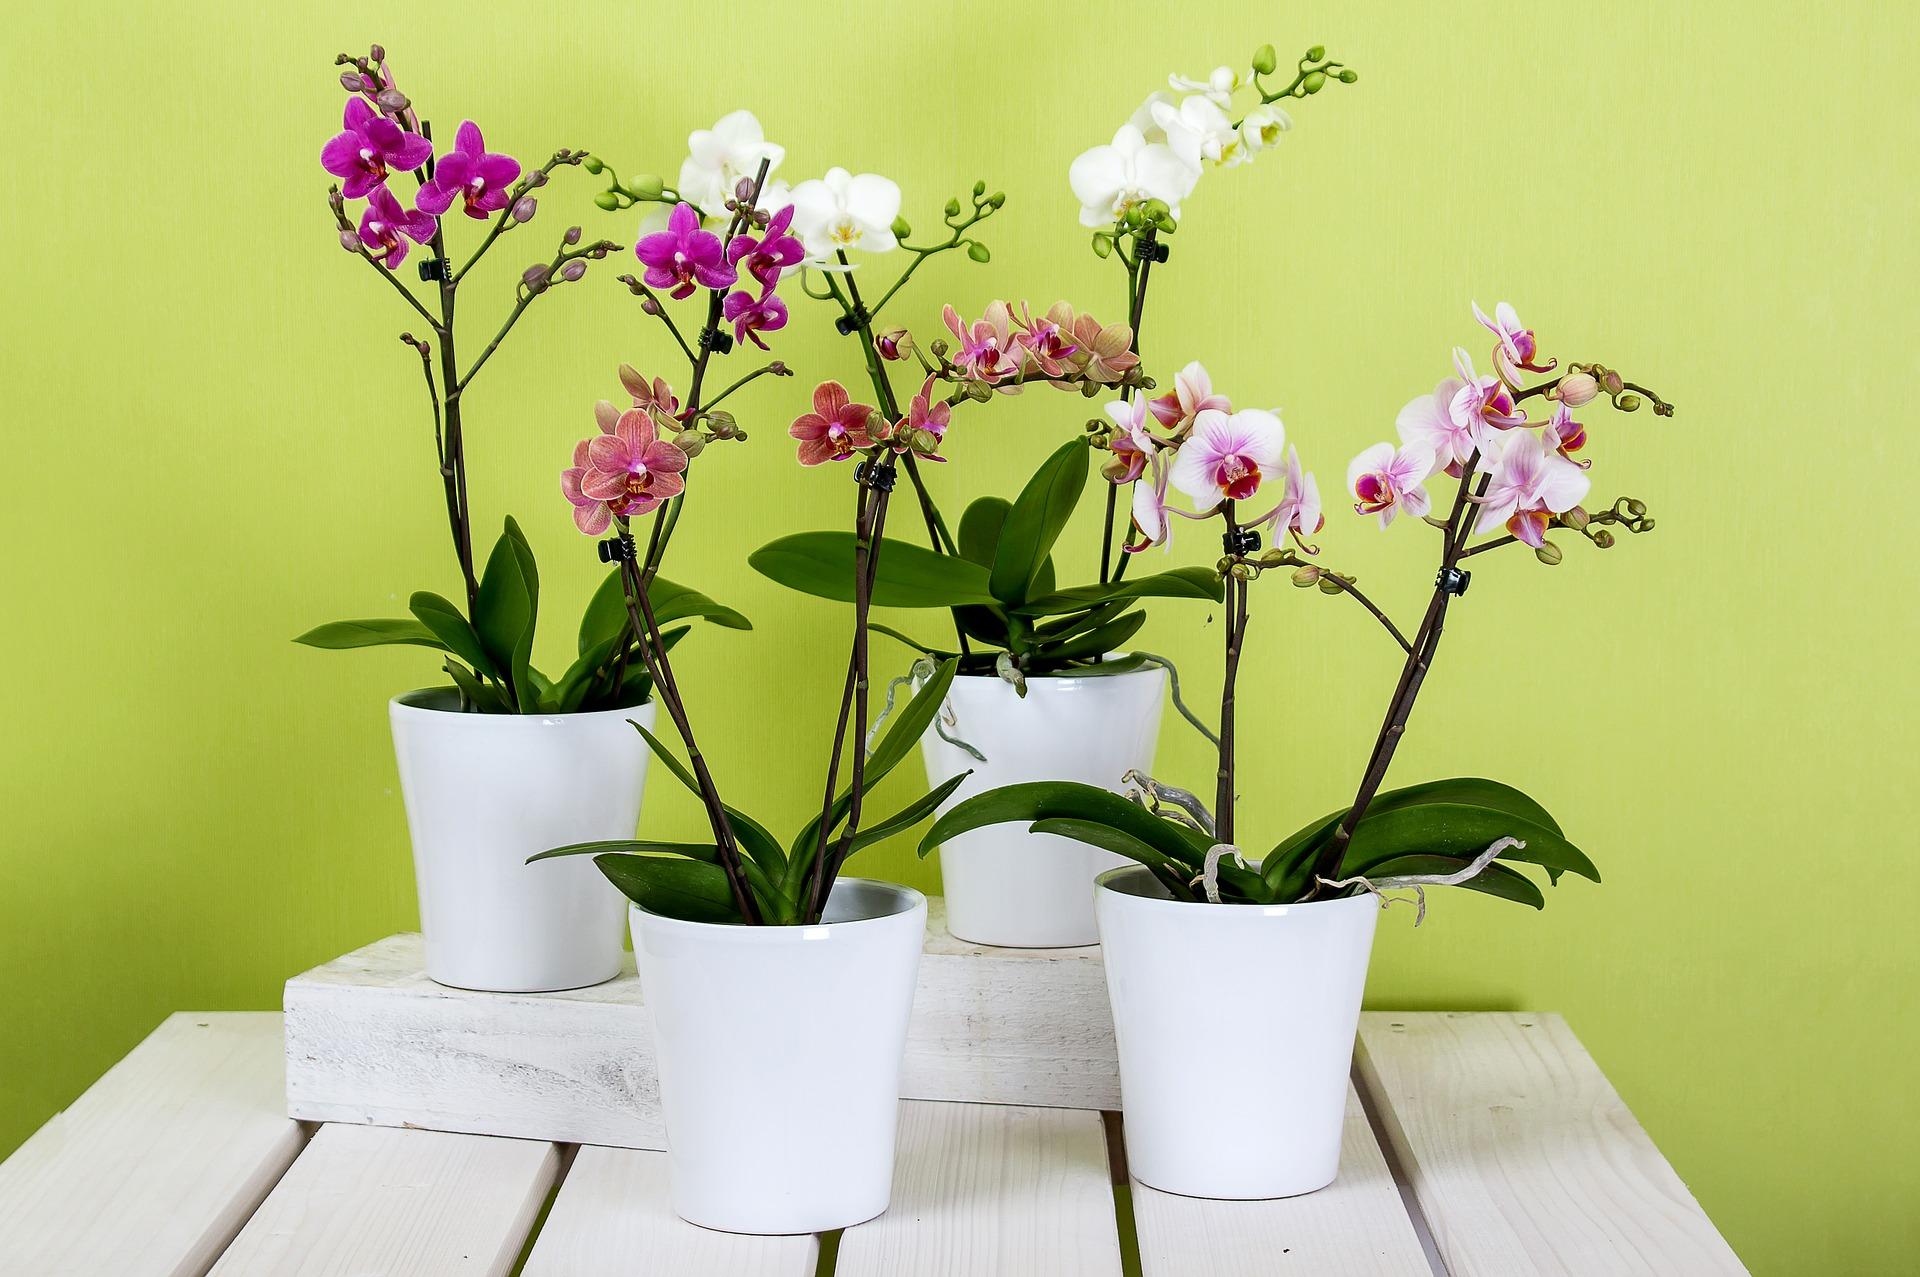 como replantar orquídeas